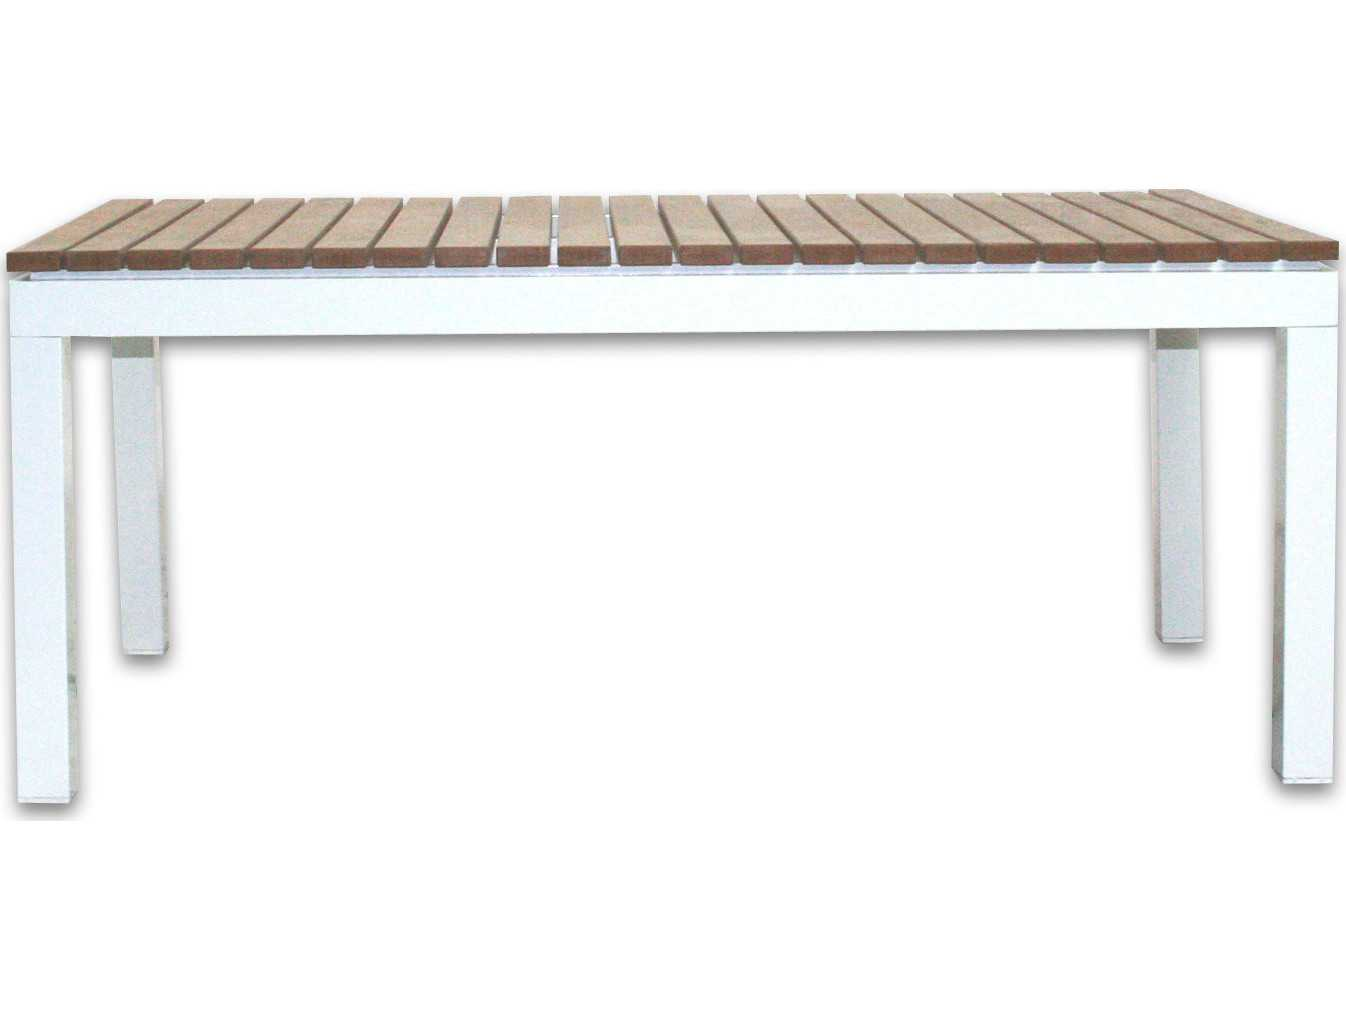 Patio heaven riviera aluminum 39 5 x 21 5 rectangular for Patio heaven